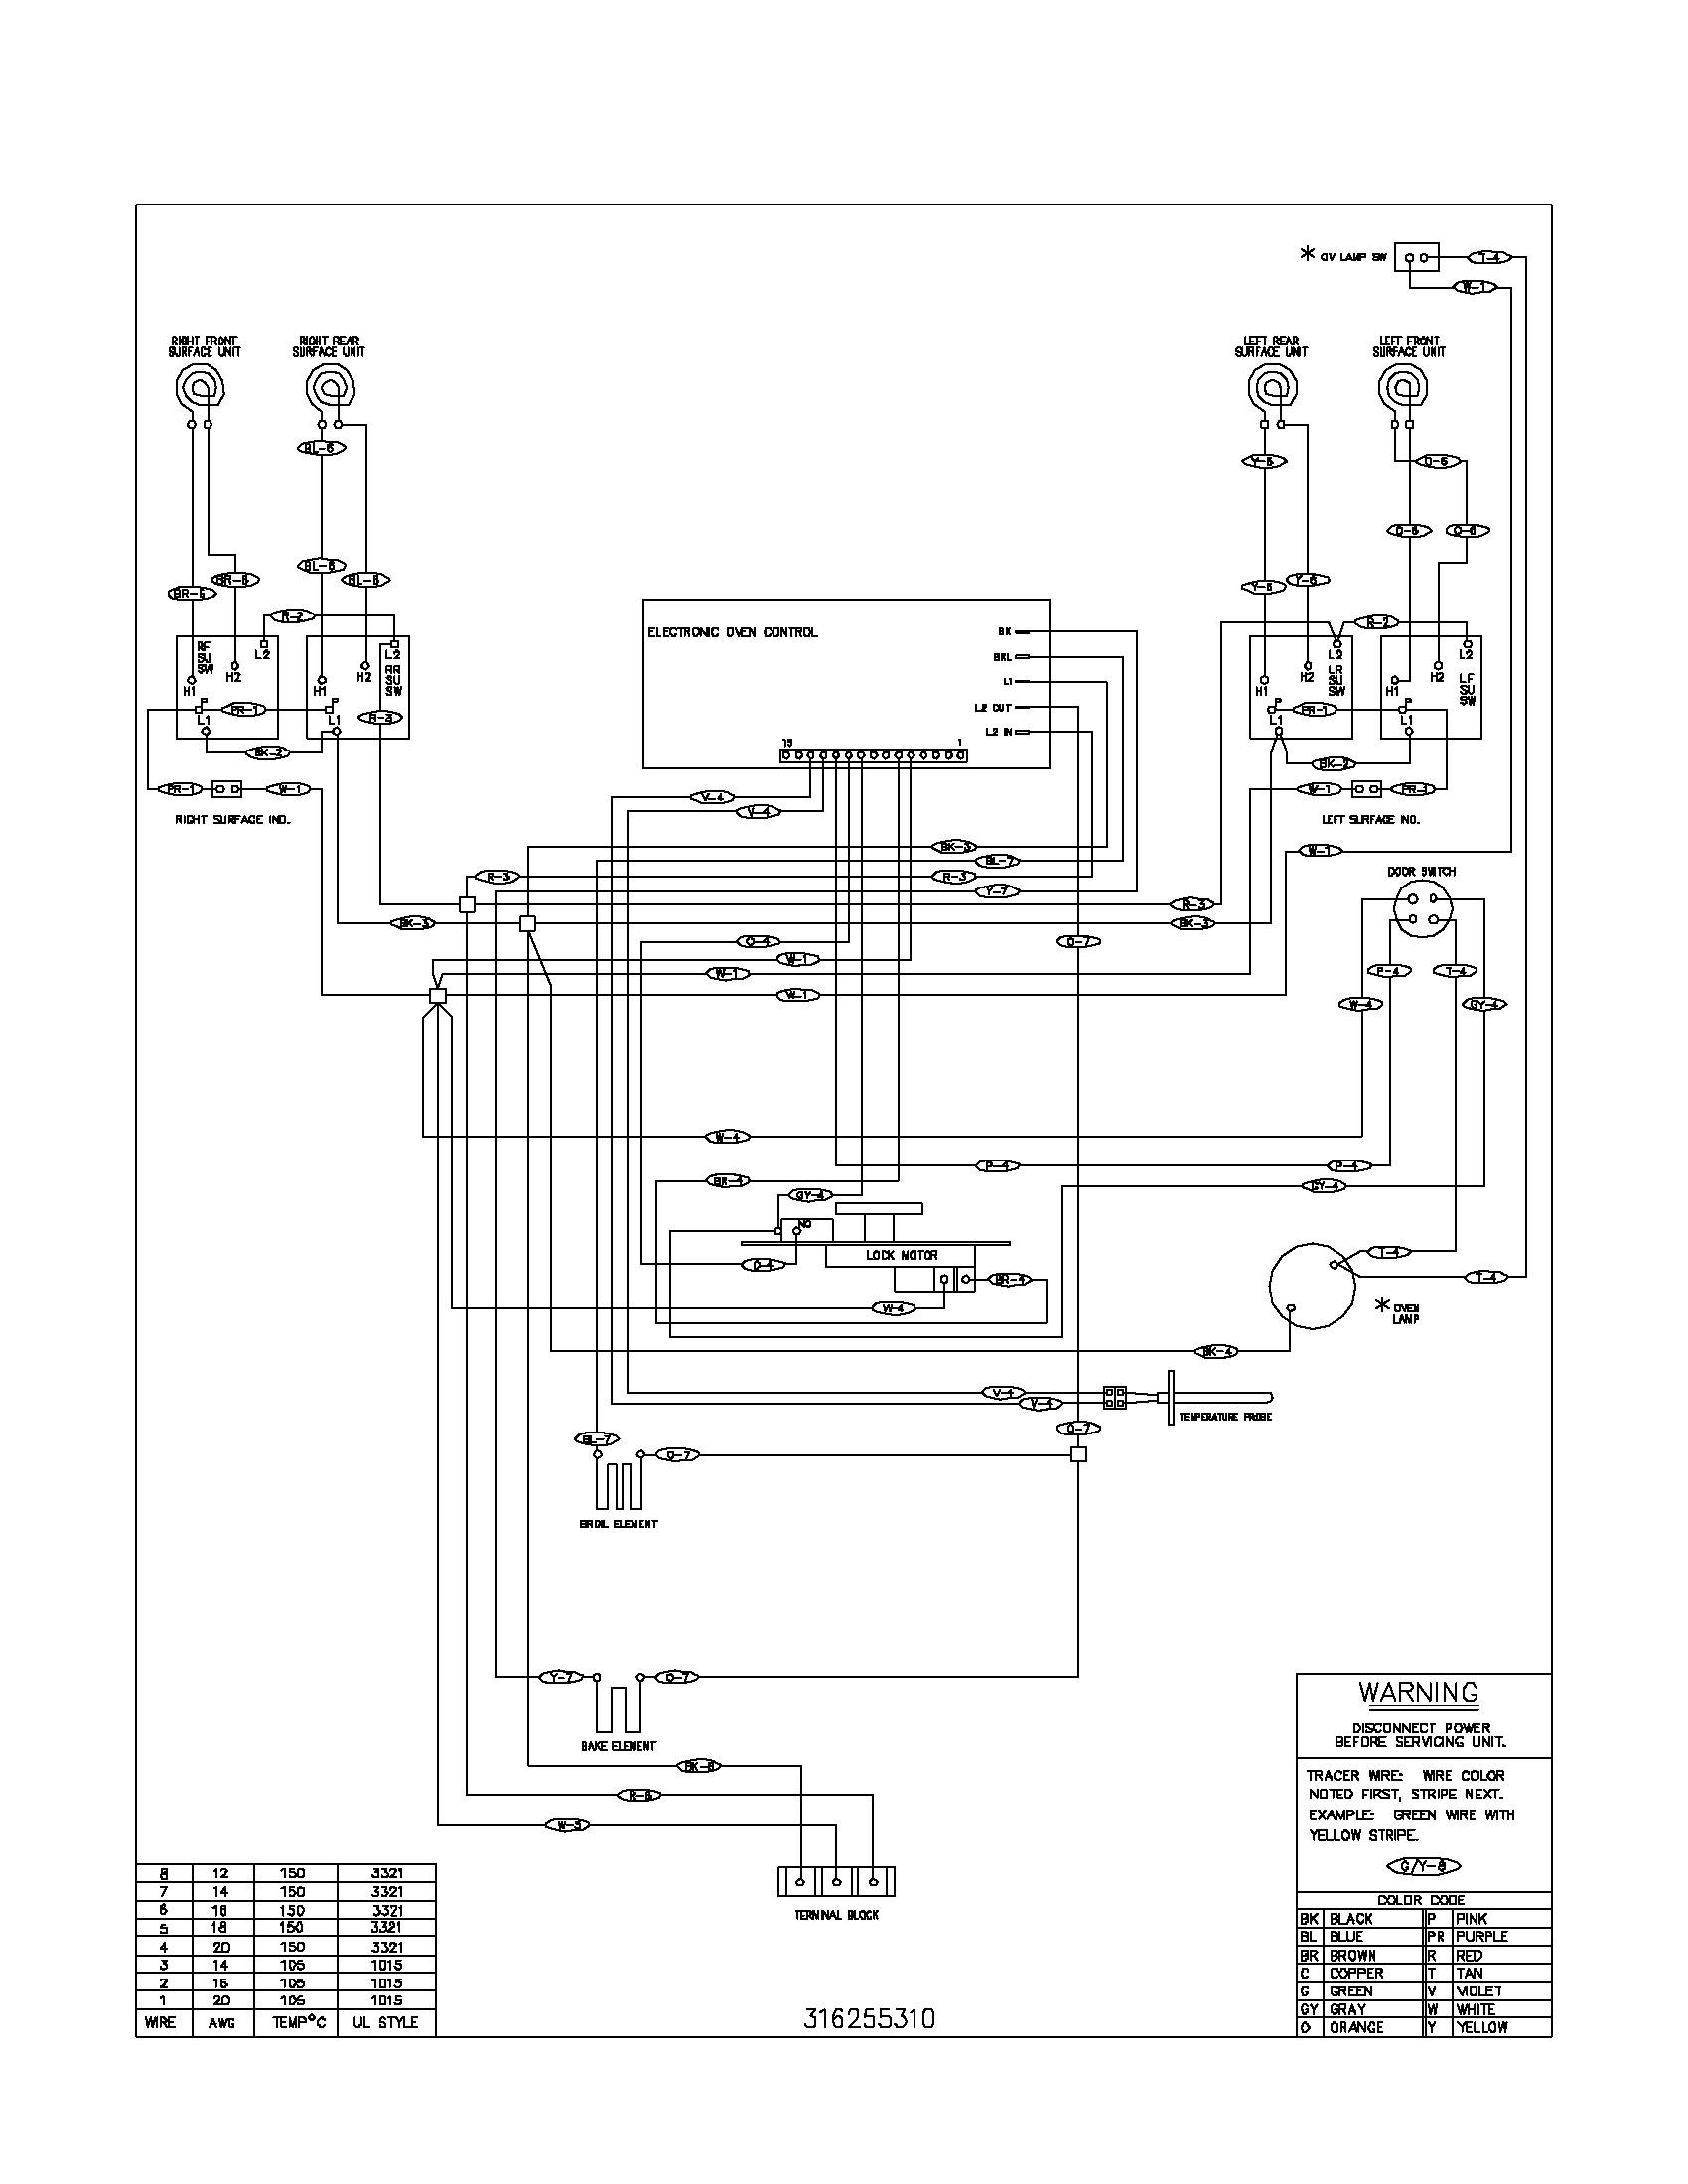 frigidaire gas range wiring diagram data wiring diagrams u2022 rh mikeadkinsguitar com Range Hood Wiring Diagram wiring diagram for frigidaire wall oven